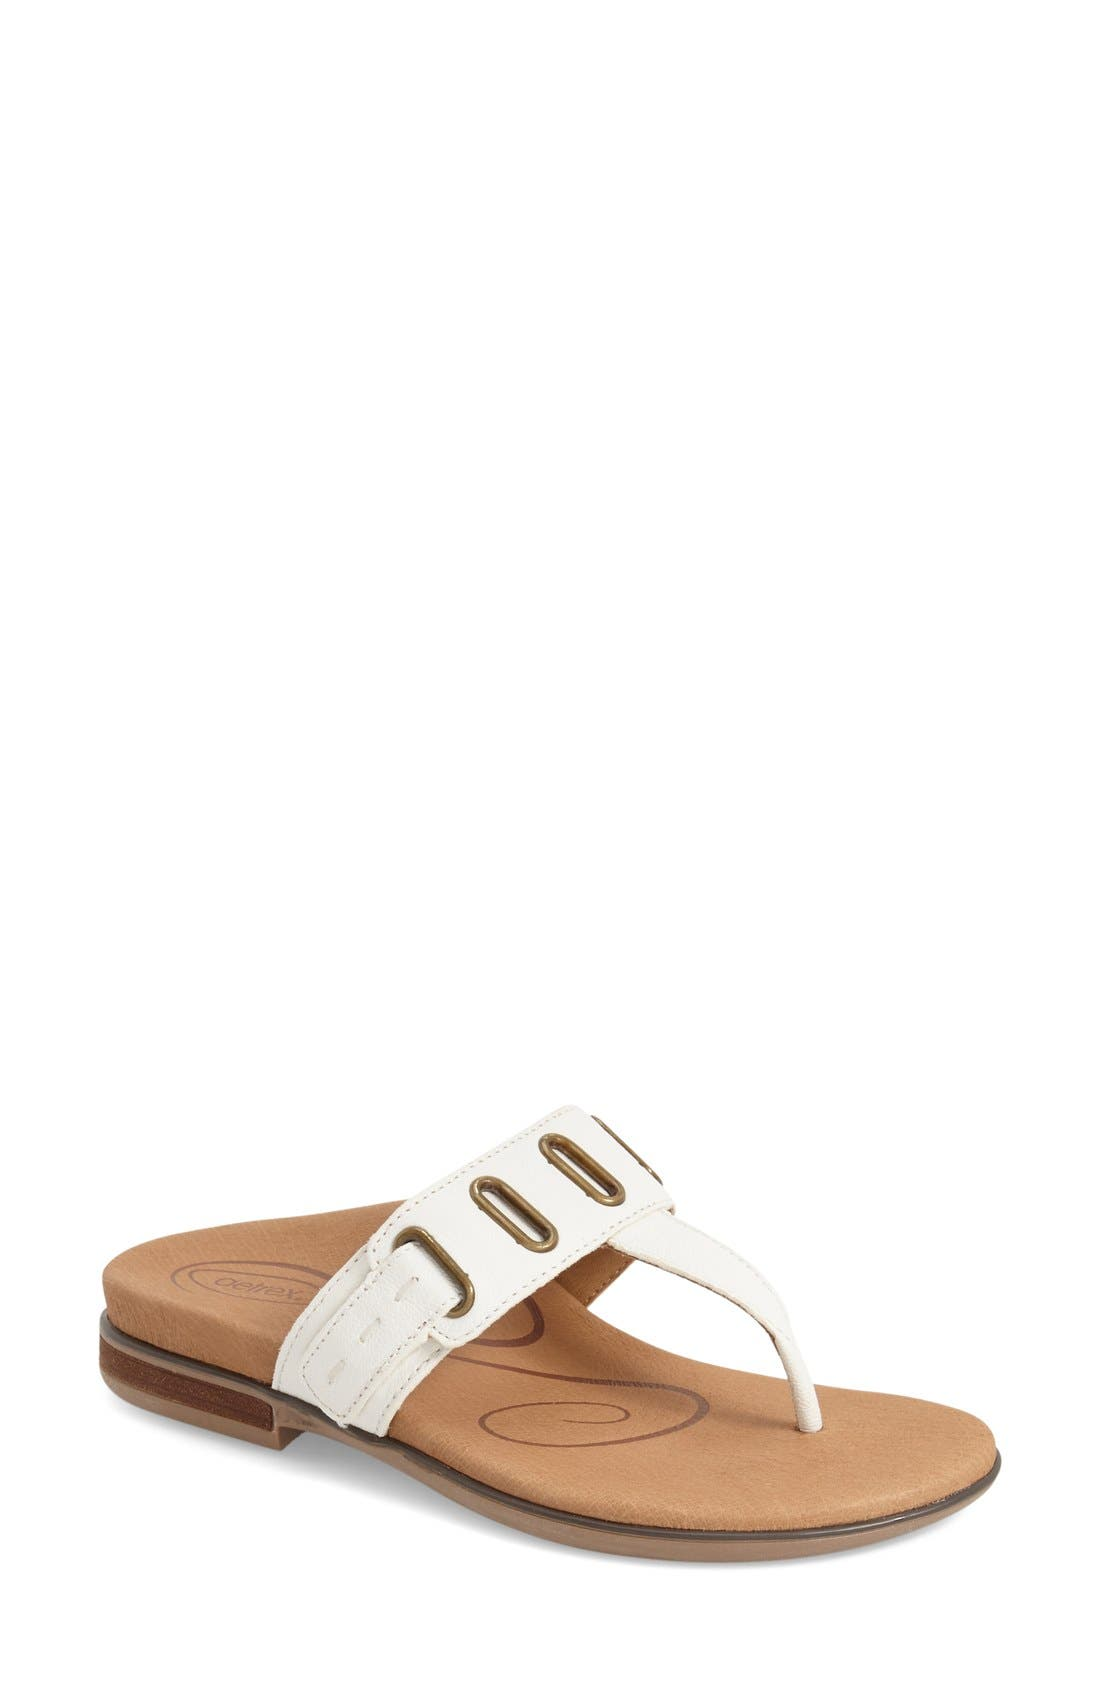 Aetrex 'Zara' Flip Flop (Women)